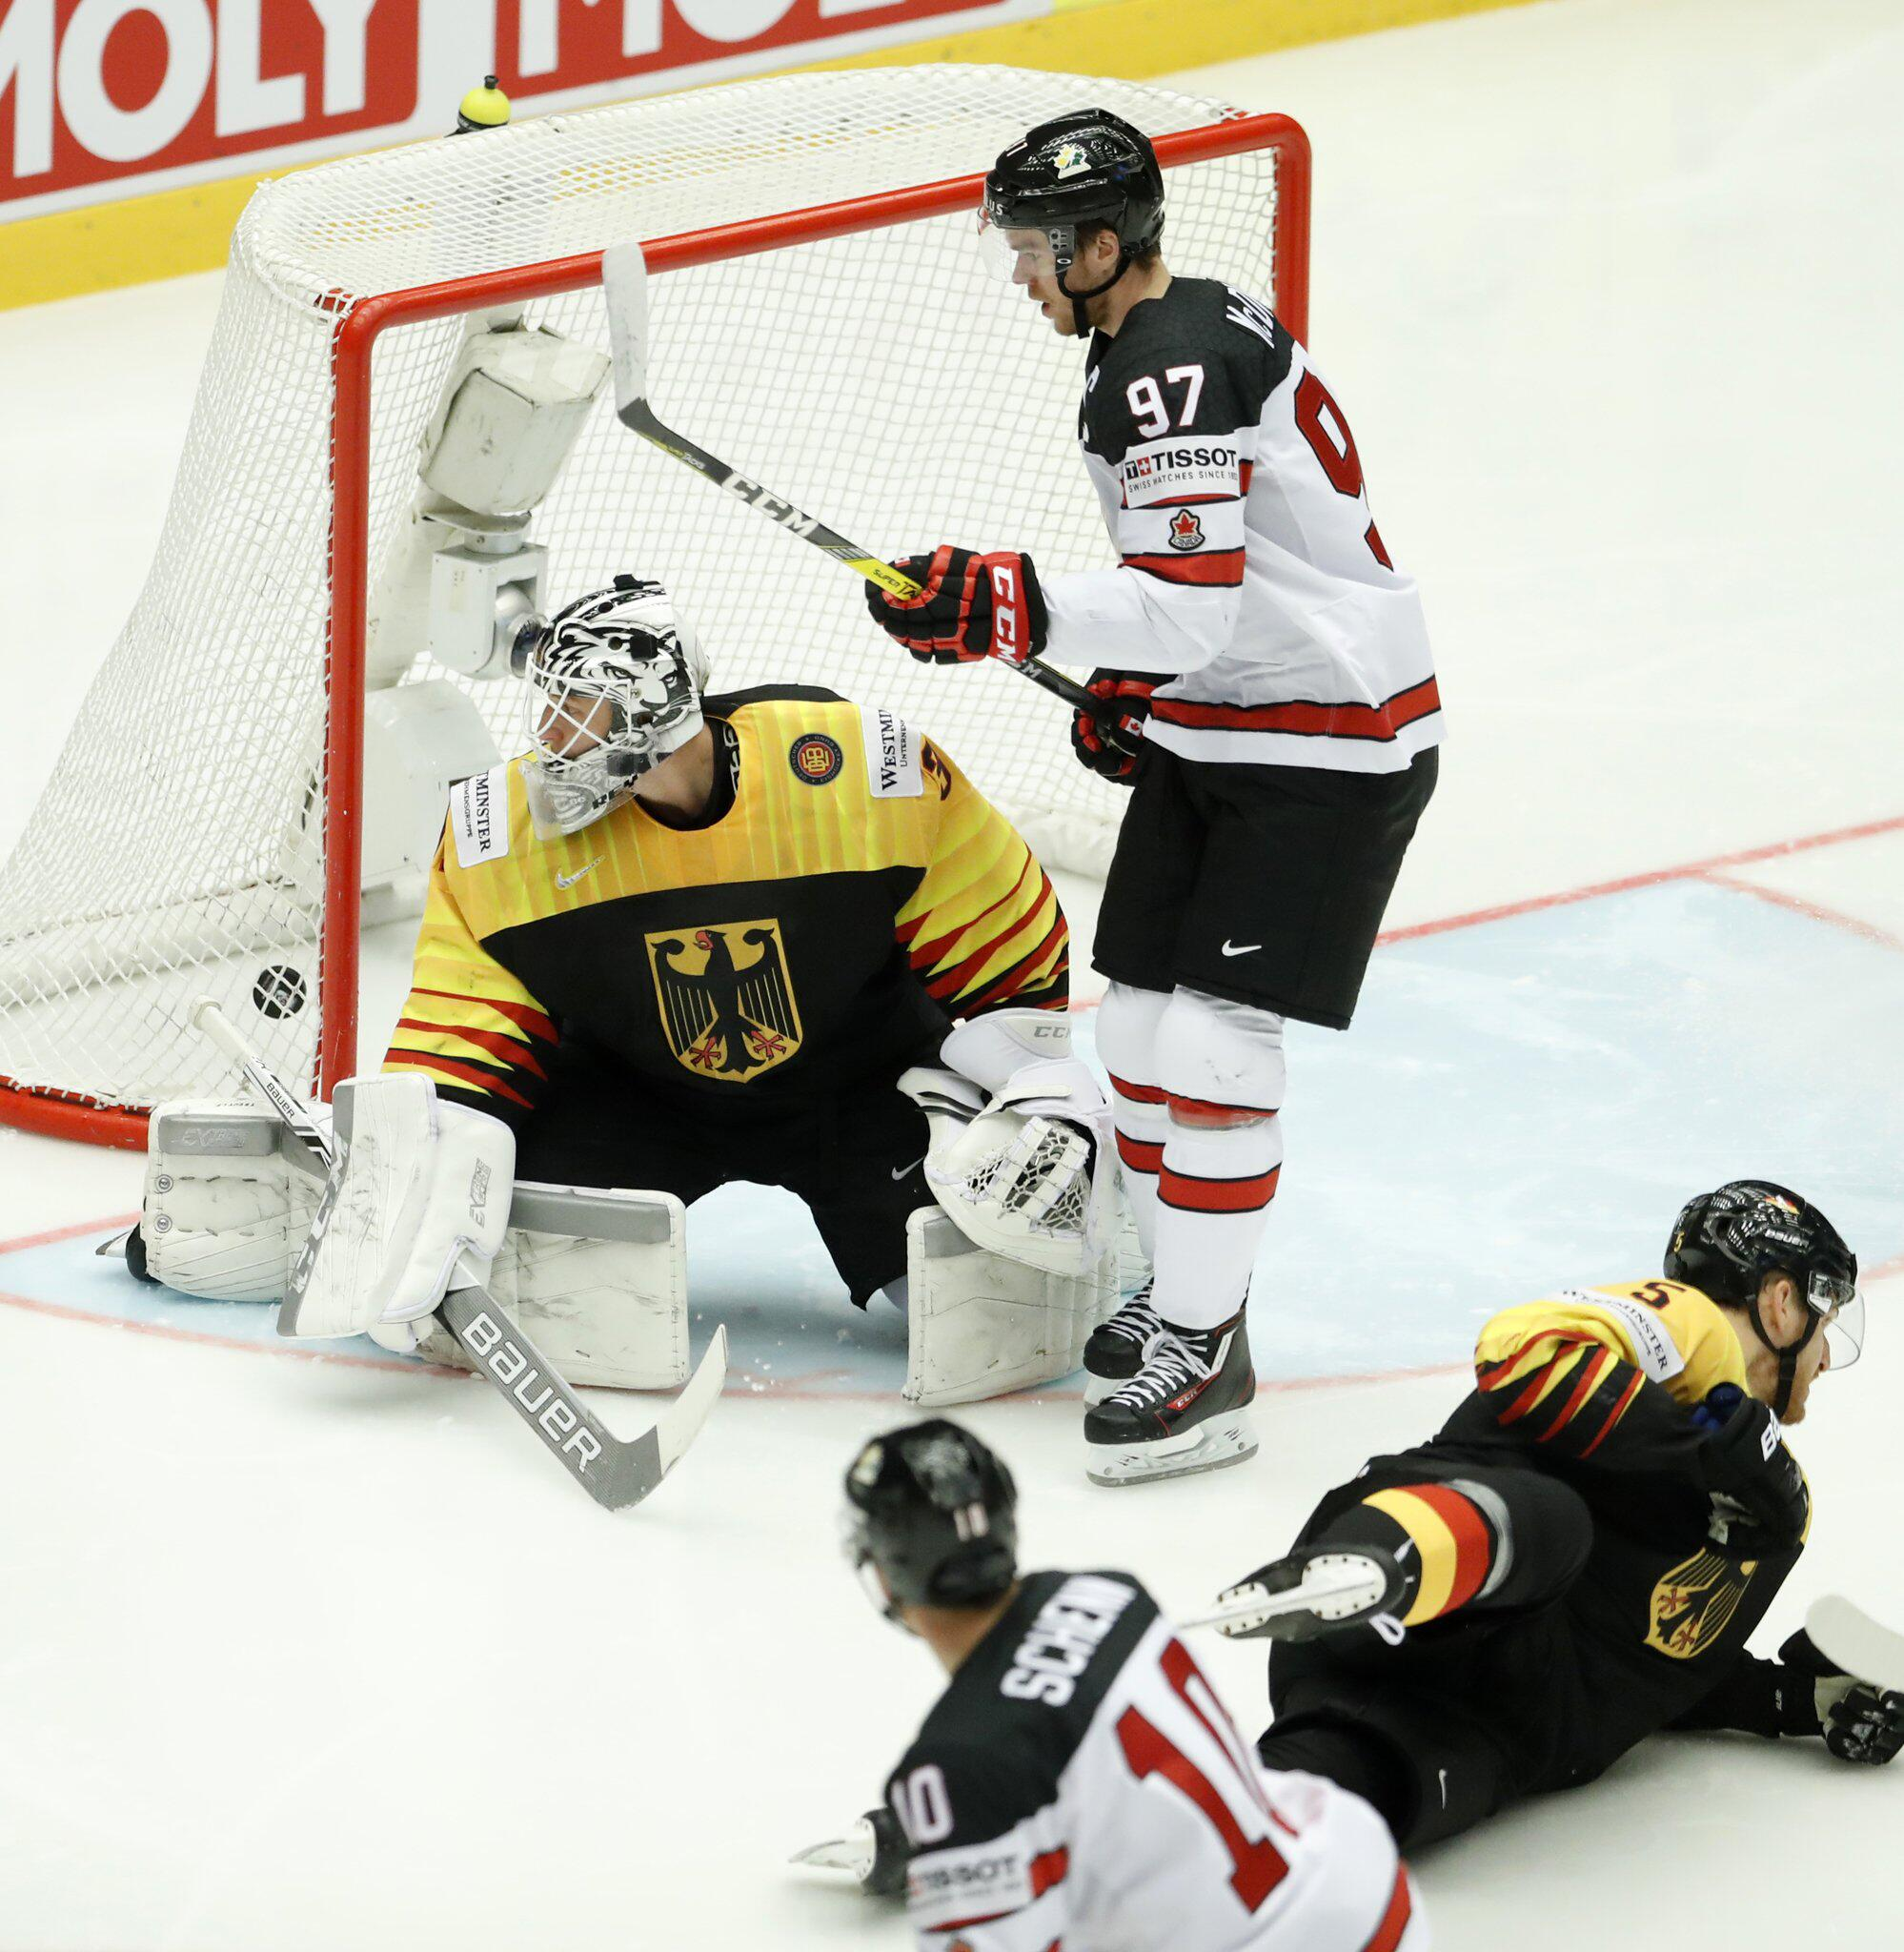 Bild zu Kanada - Deutschland, Eishockey-WM, Herning, Niklas Treutle, Korbinian Holzer, Connor McDavid